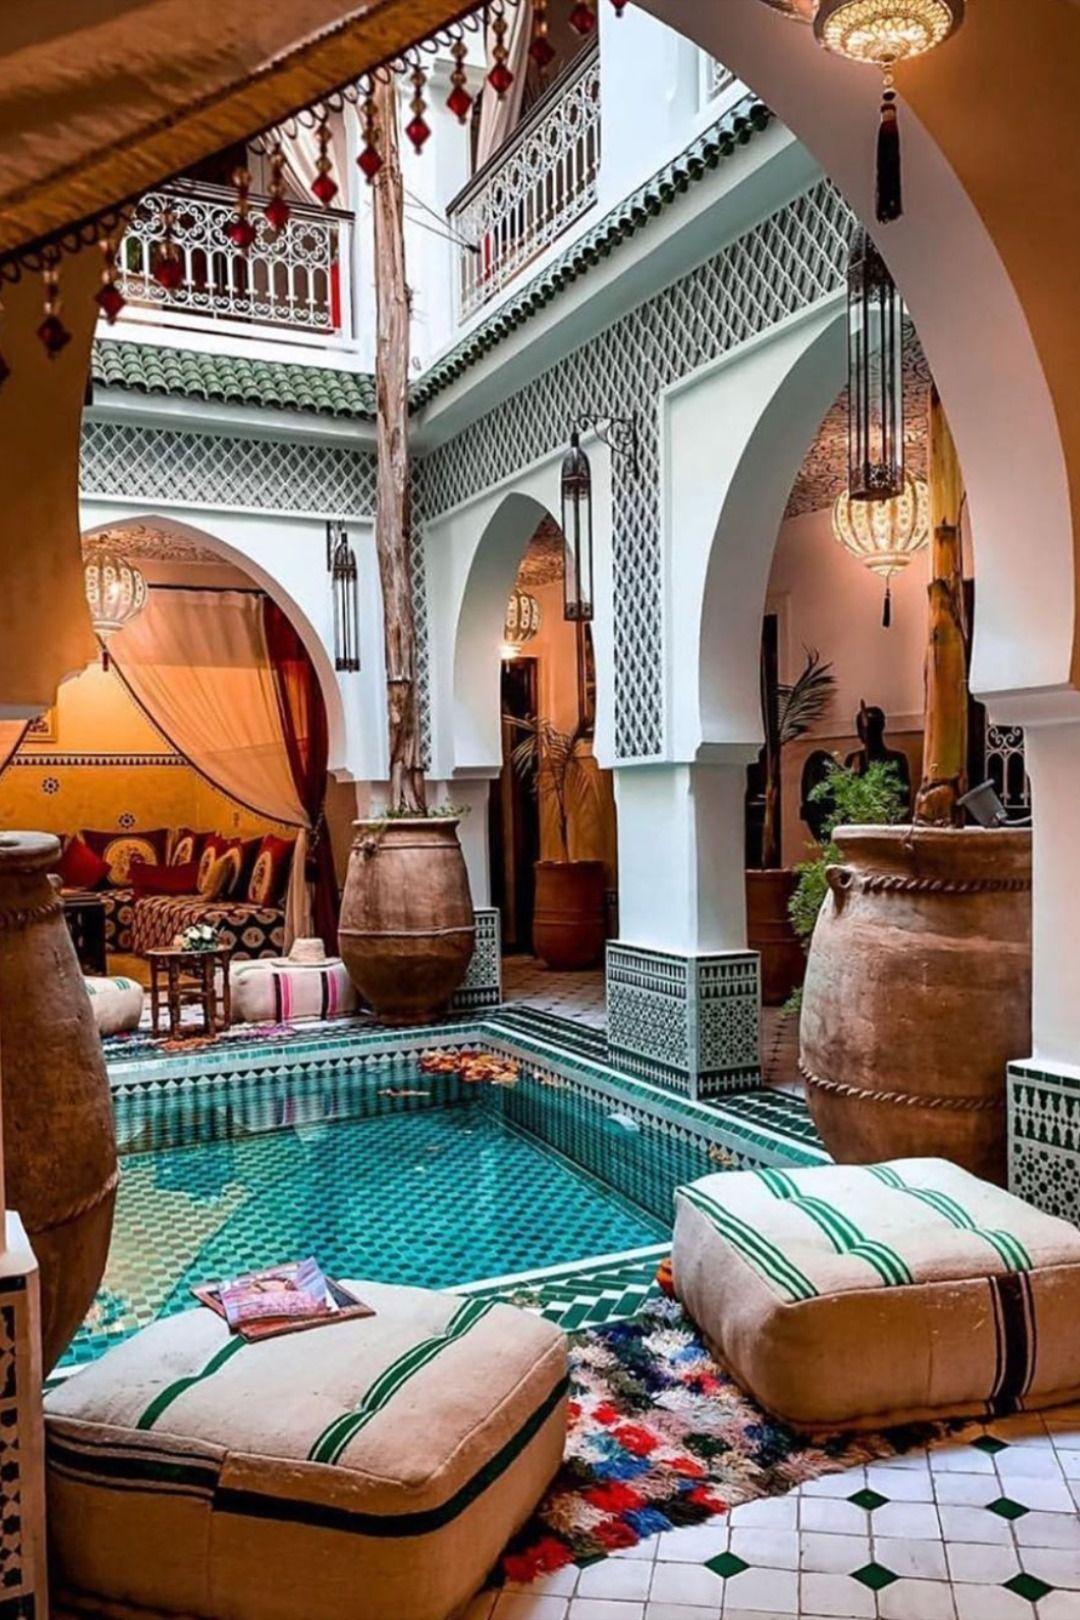 Pin By Salvador Espinoza Rodriguez On Luxury Home Morrocan House Patio Design Marrakech